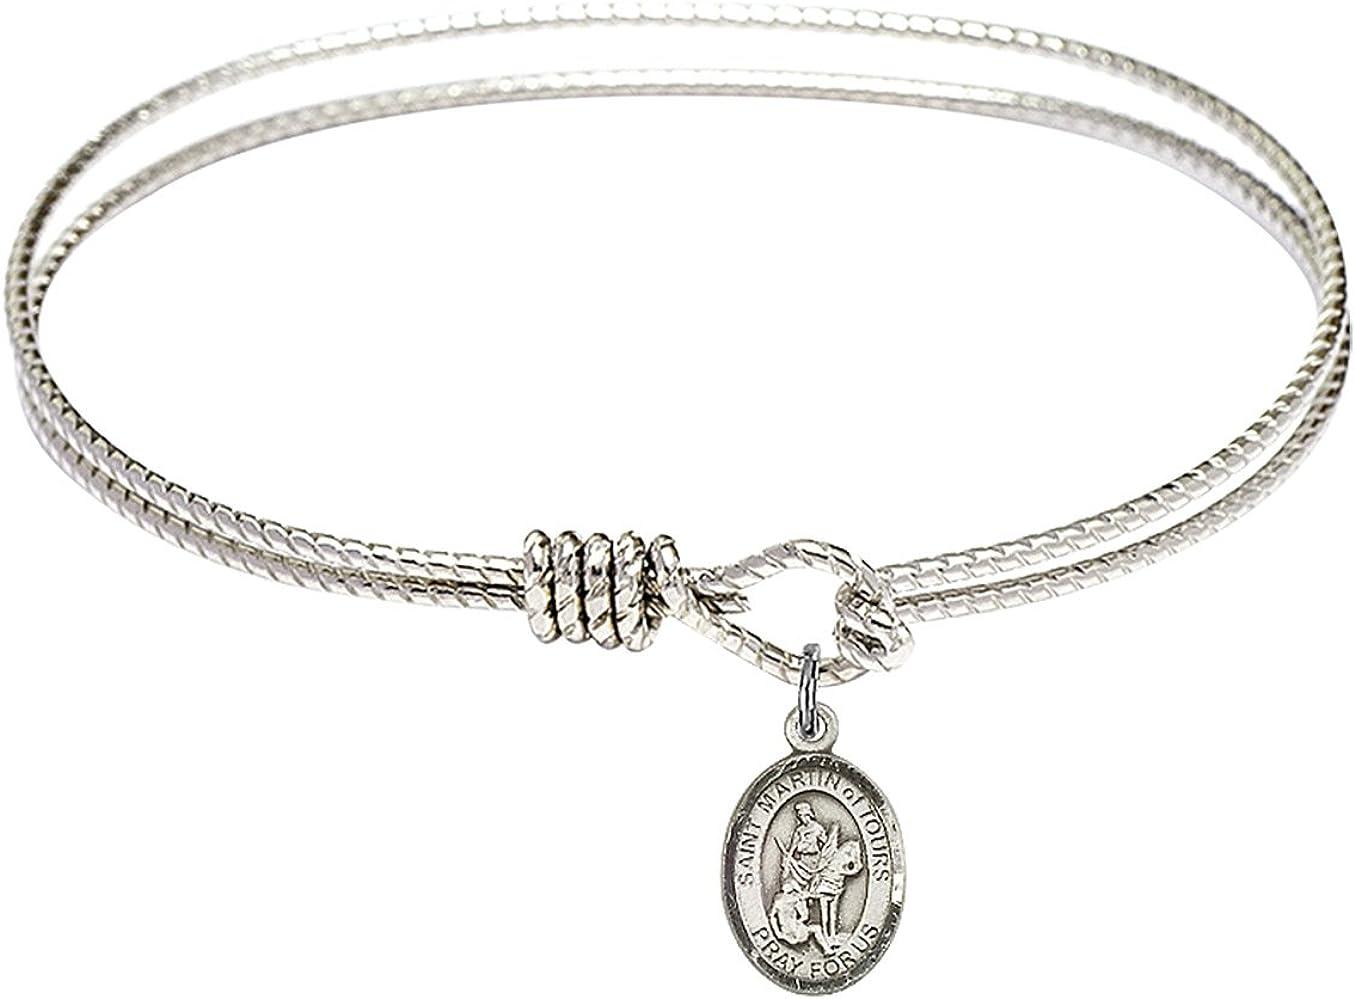 Bonyak Jewelry Oval Eye Hook Bangle St. Bracelet of w New products Max 48% OFF world's highest quality popular Martin Tou